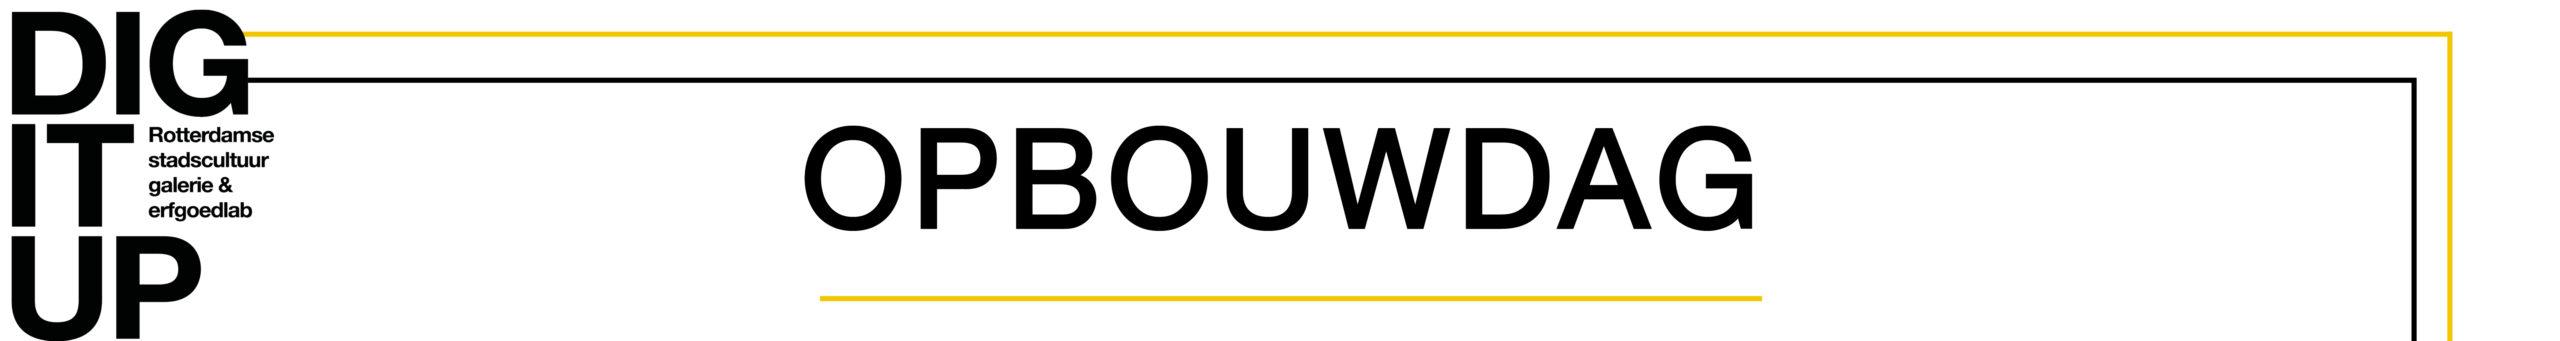 Opbouwdag Logo